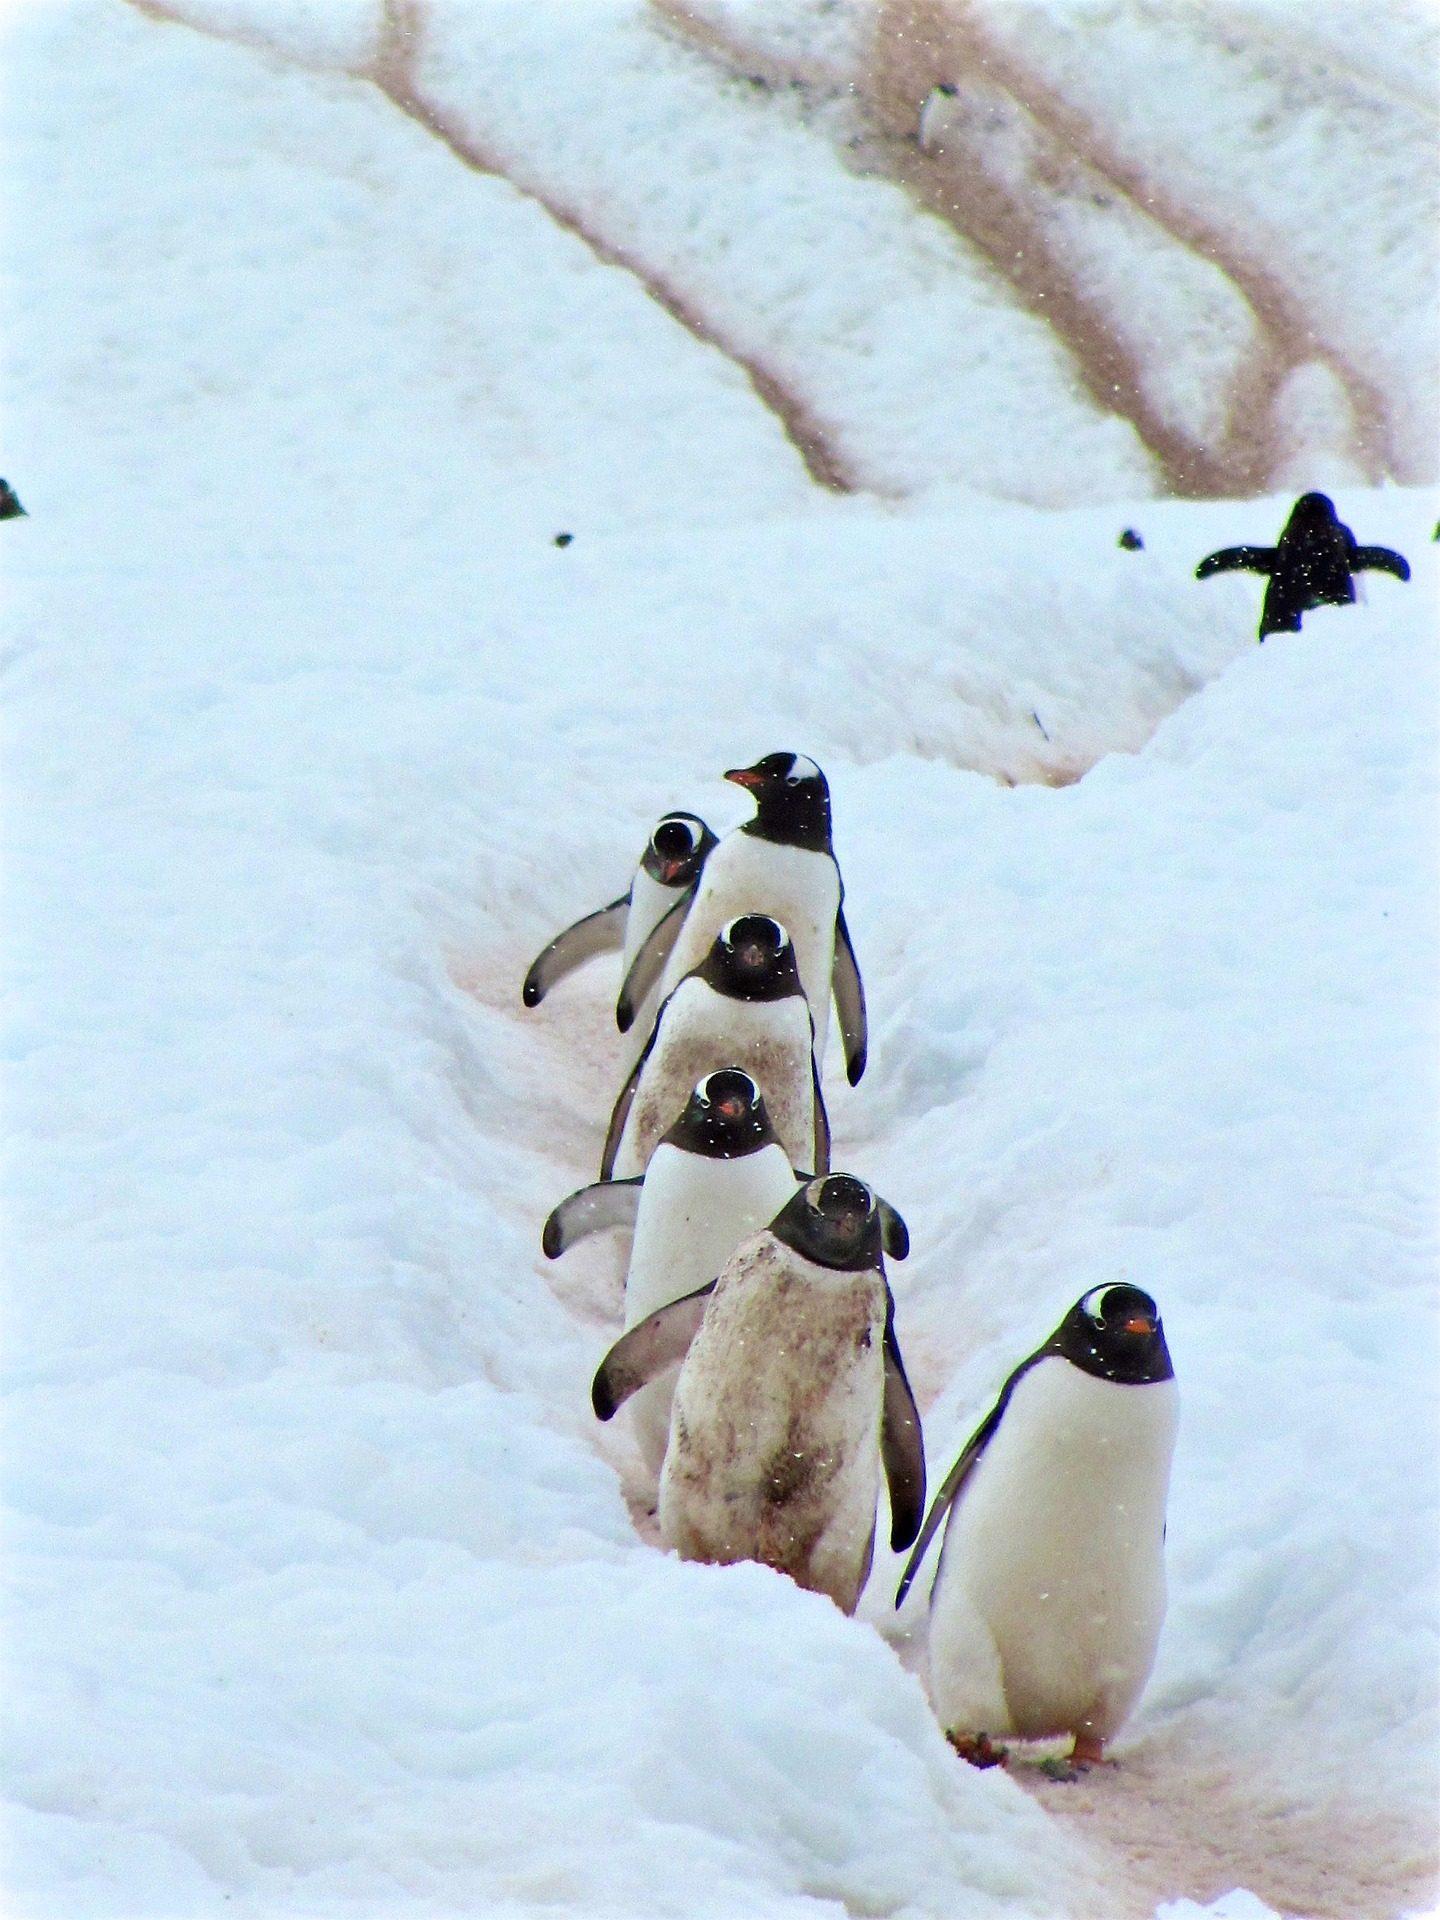 Pinguine, Vögel, Schnee, Winter, Kälte - Wallpaper HD - Prof.-falken.com